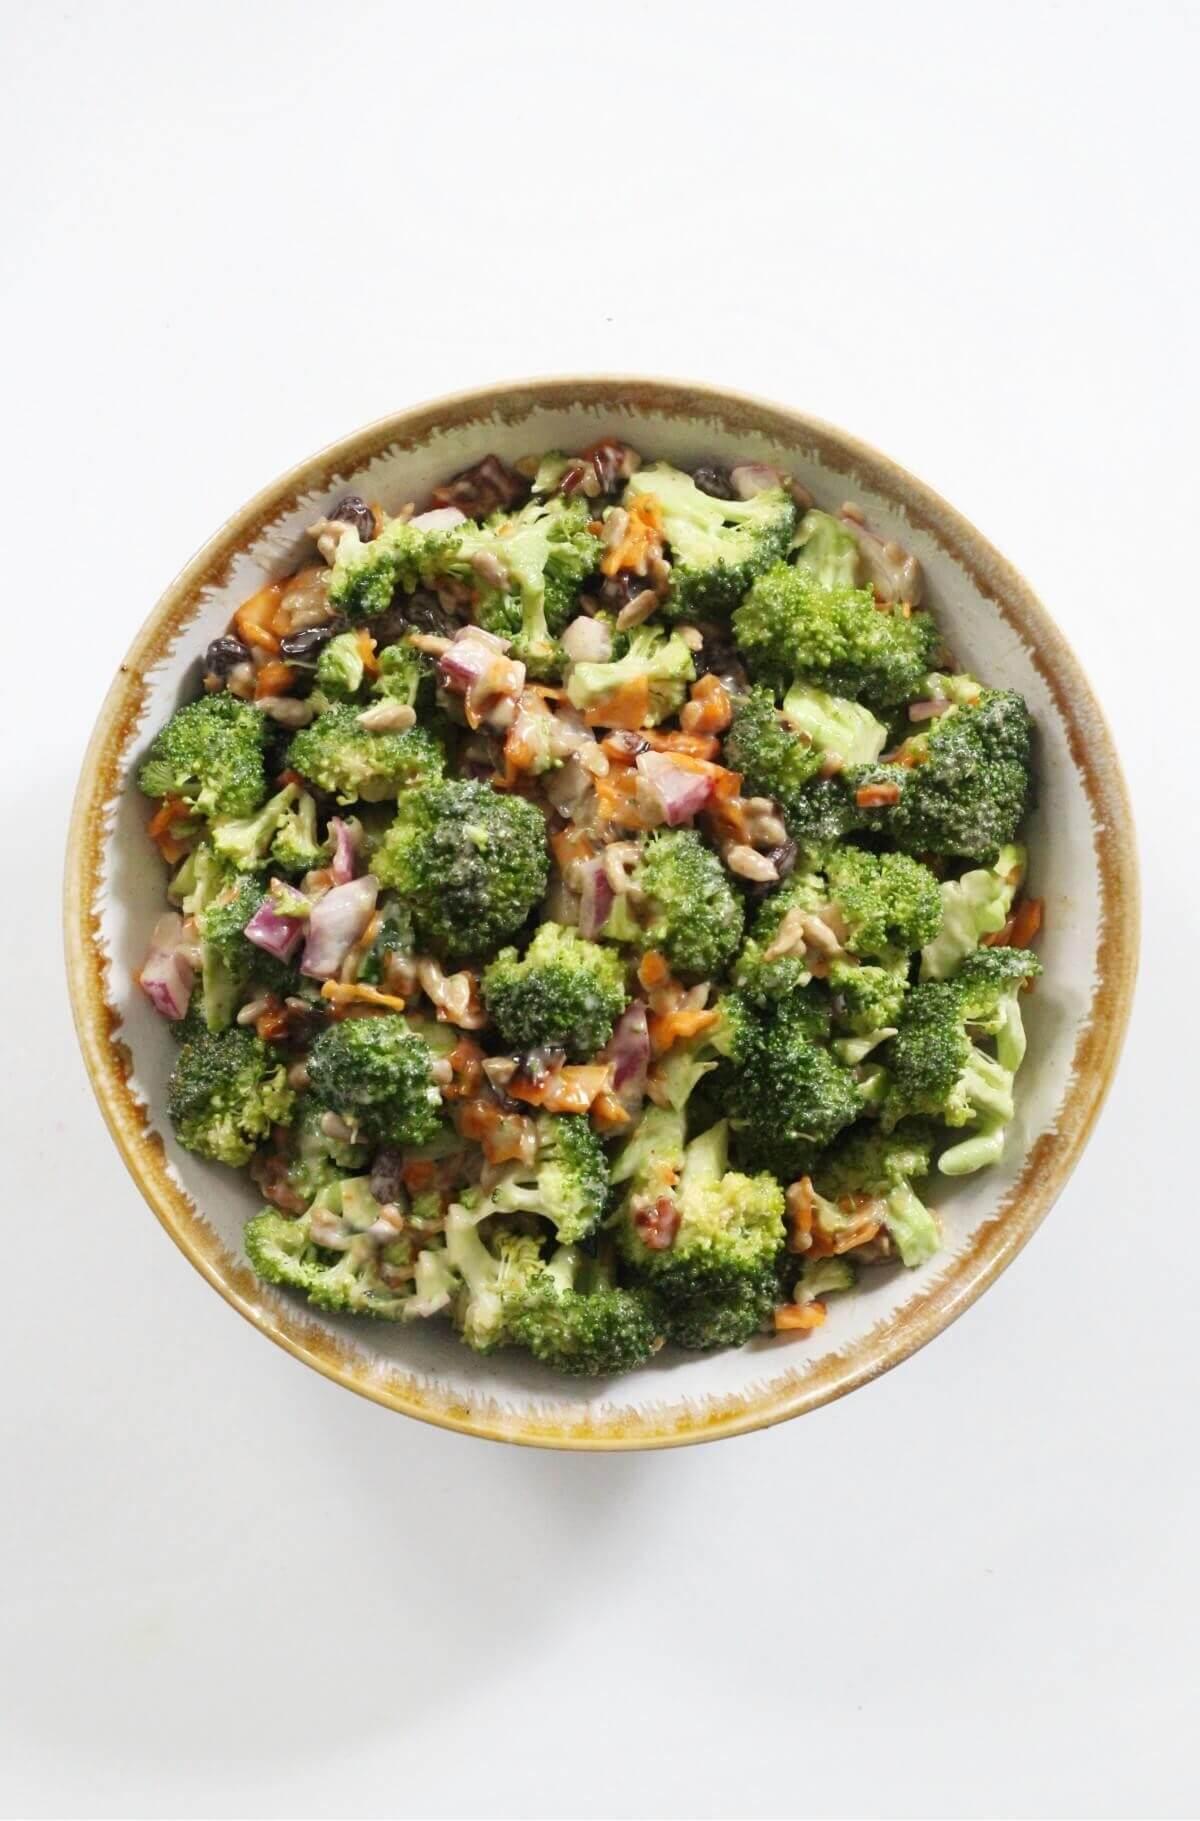 centered overhead view of vegan broccoli salad